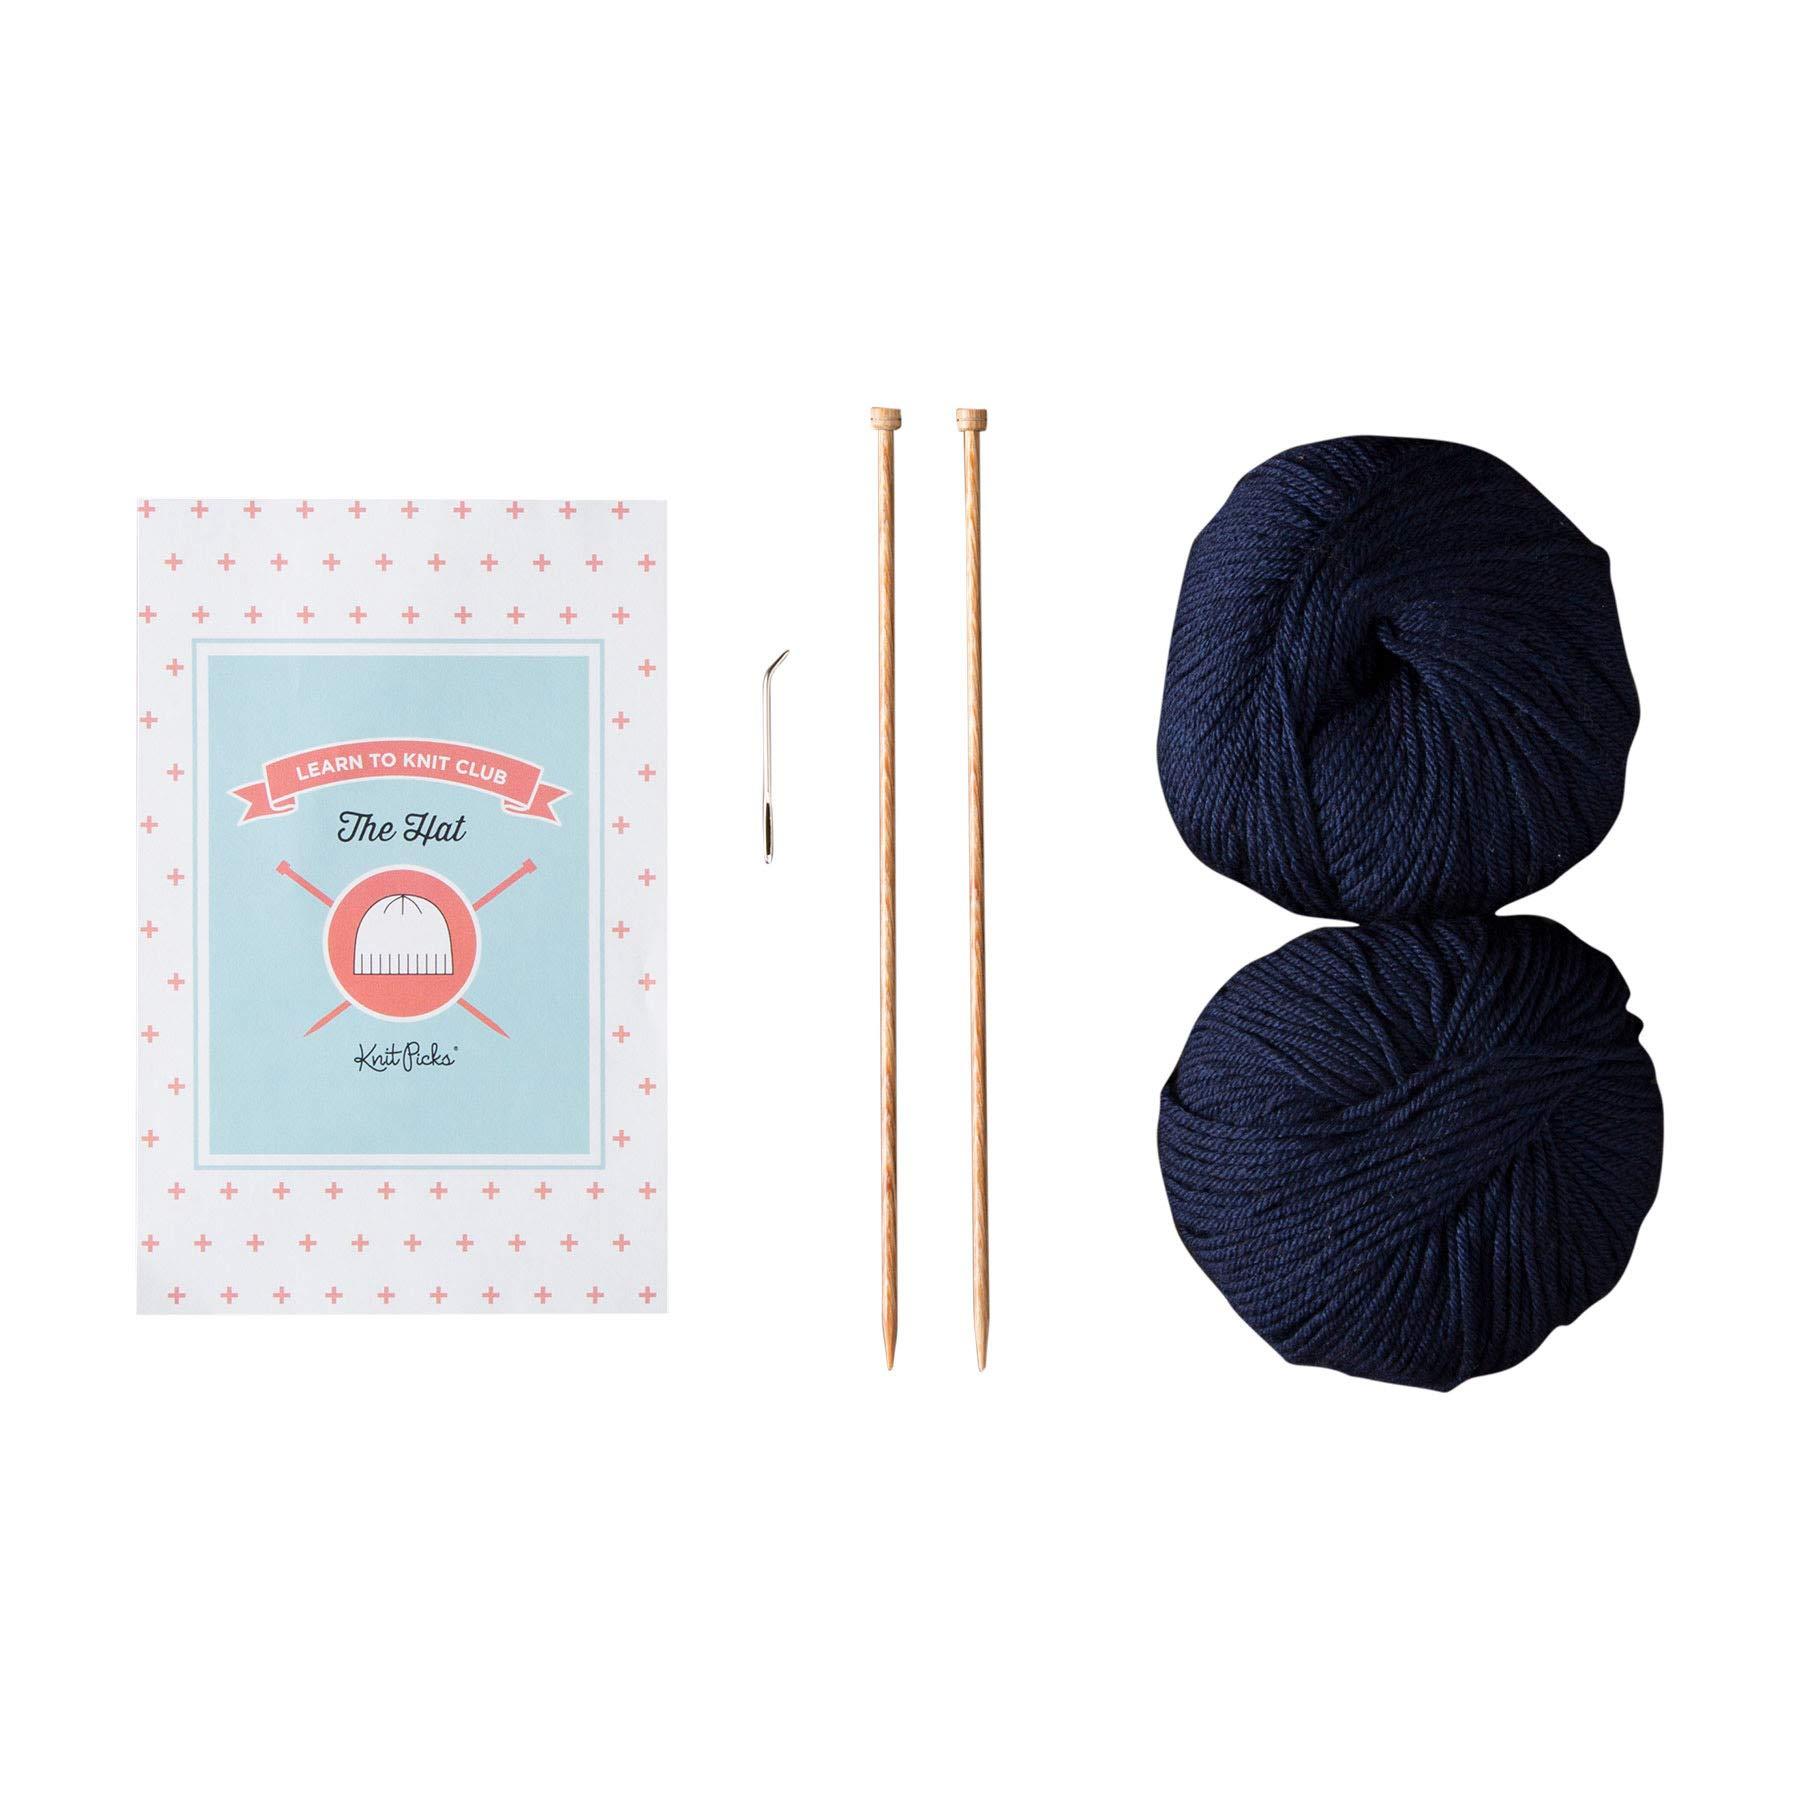 Knit Picks Learn to Knit Club: The Hat - Beginner Knitting Kit (Blue)